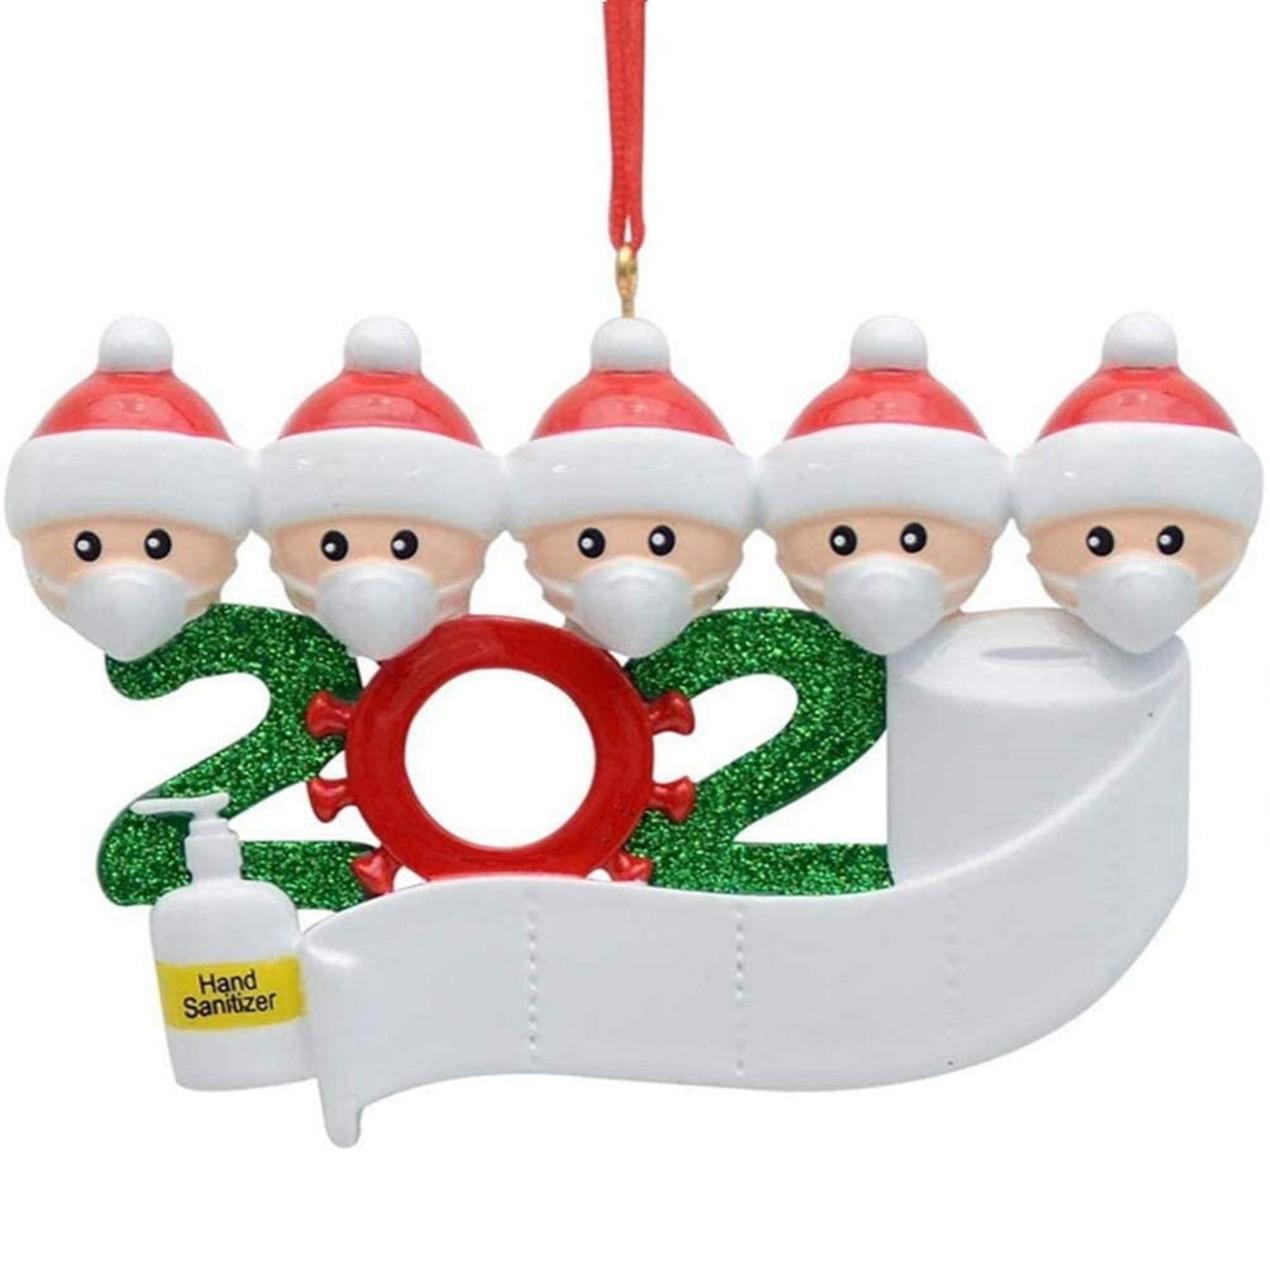 2020 Quarantine Family Personalized Christmas Ornaments